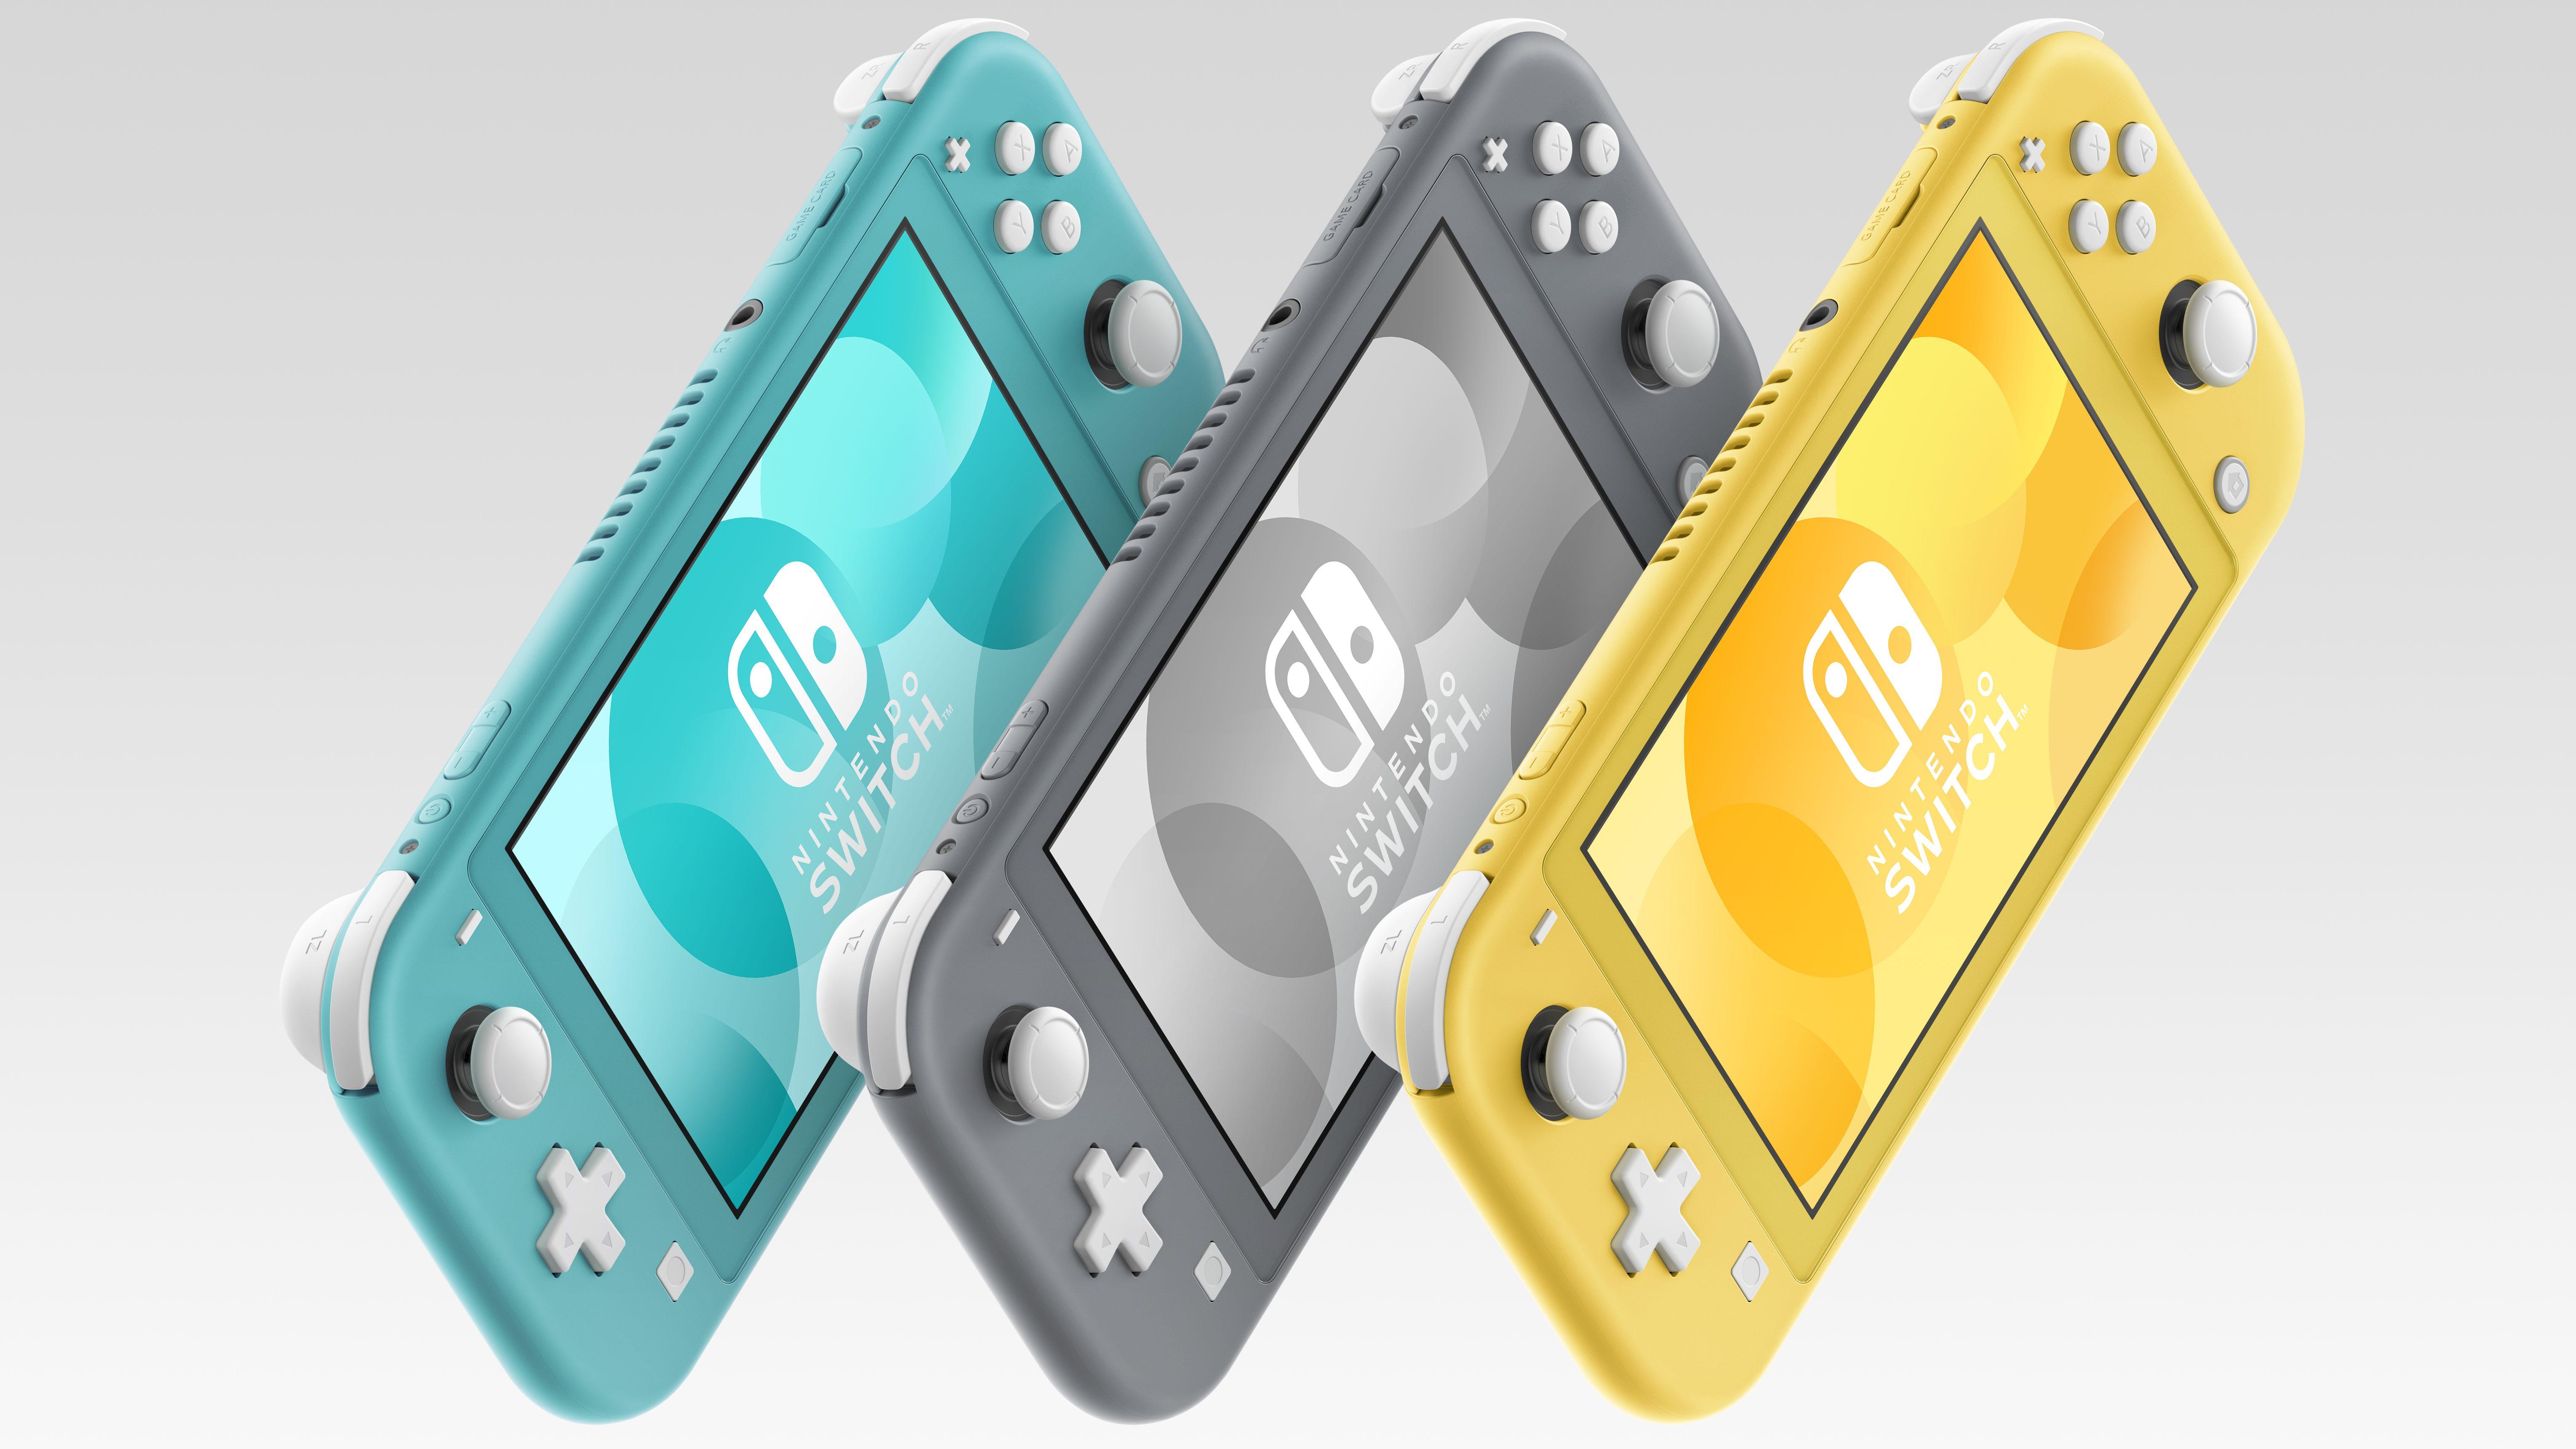 The Nintendo Switch Lite